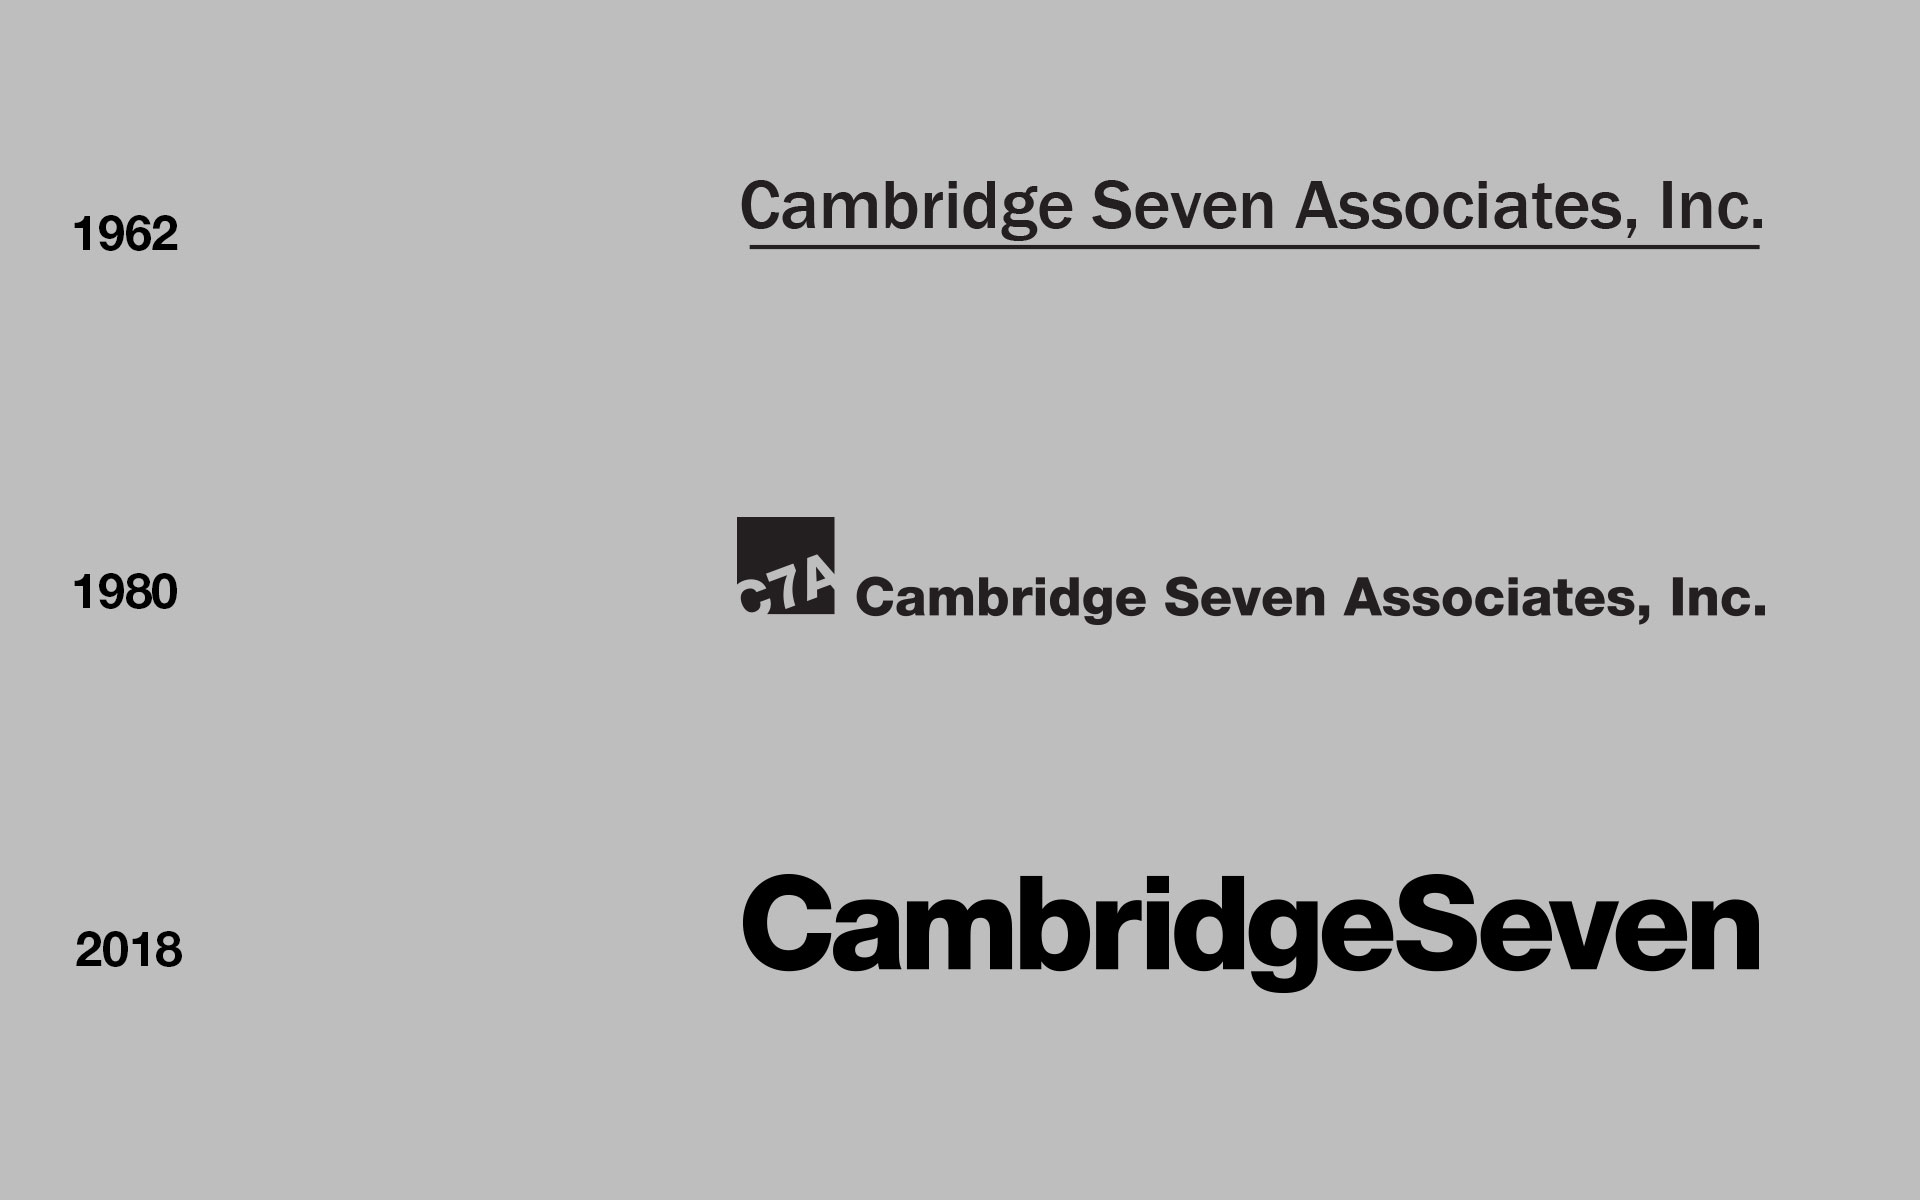 CambridgeSeven branding